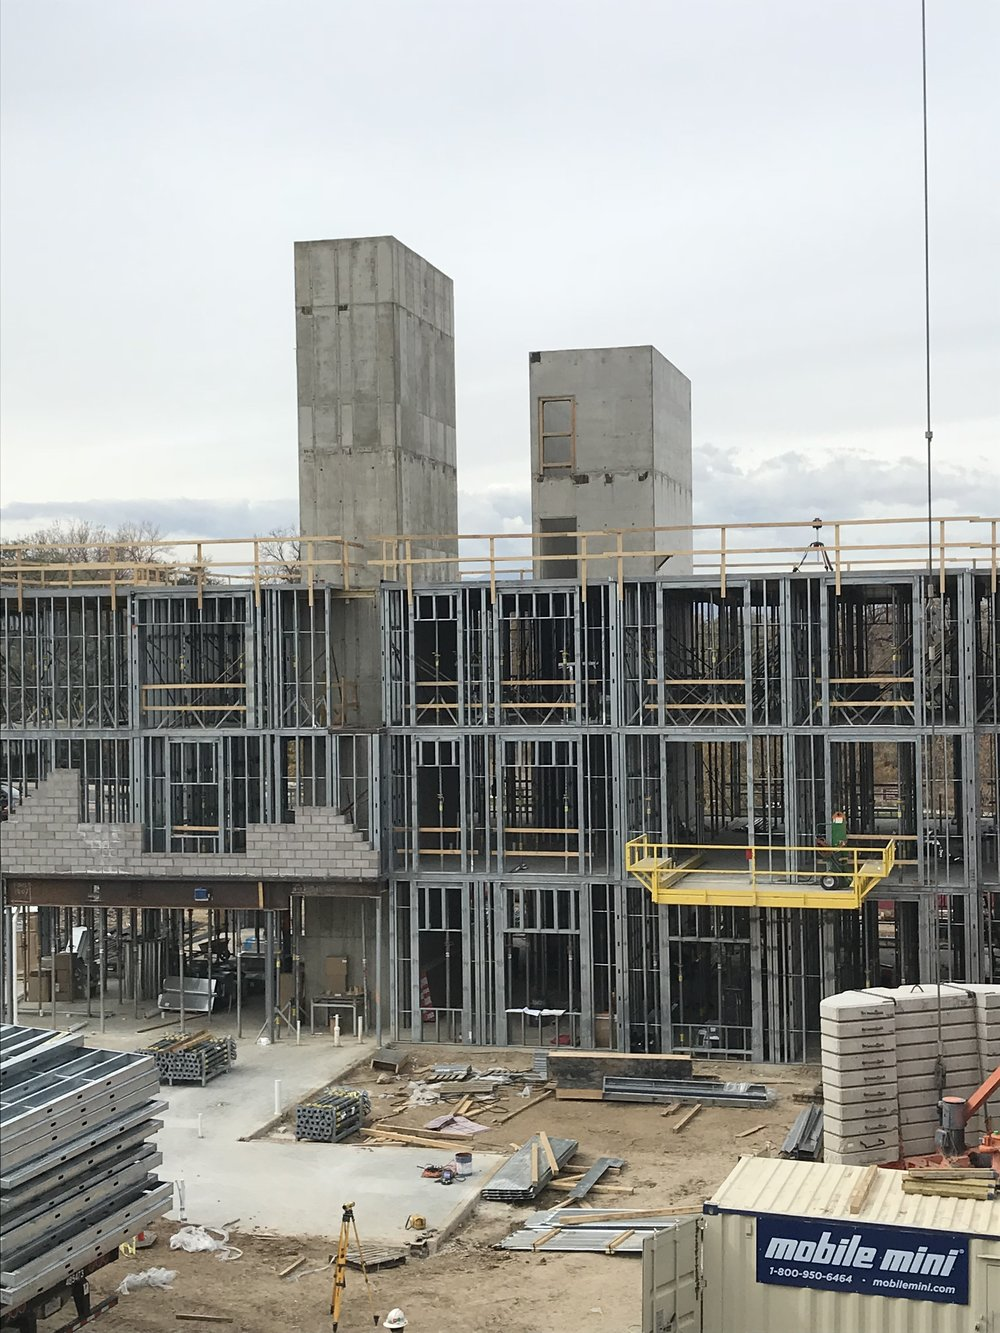 Westminster Senior Living - Currently Under Construction